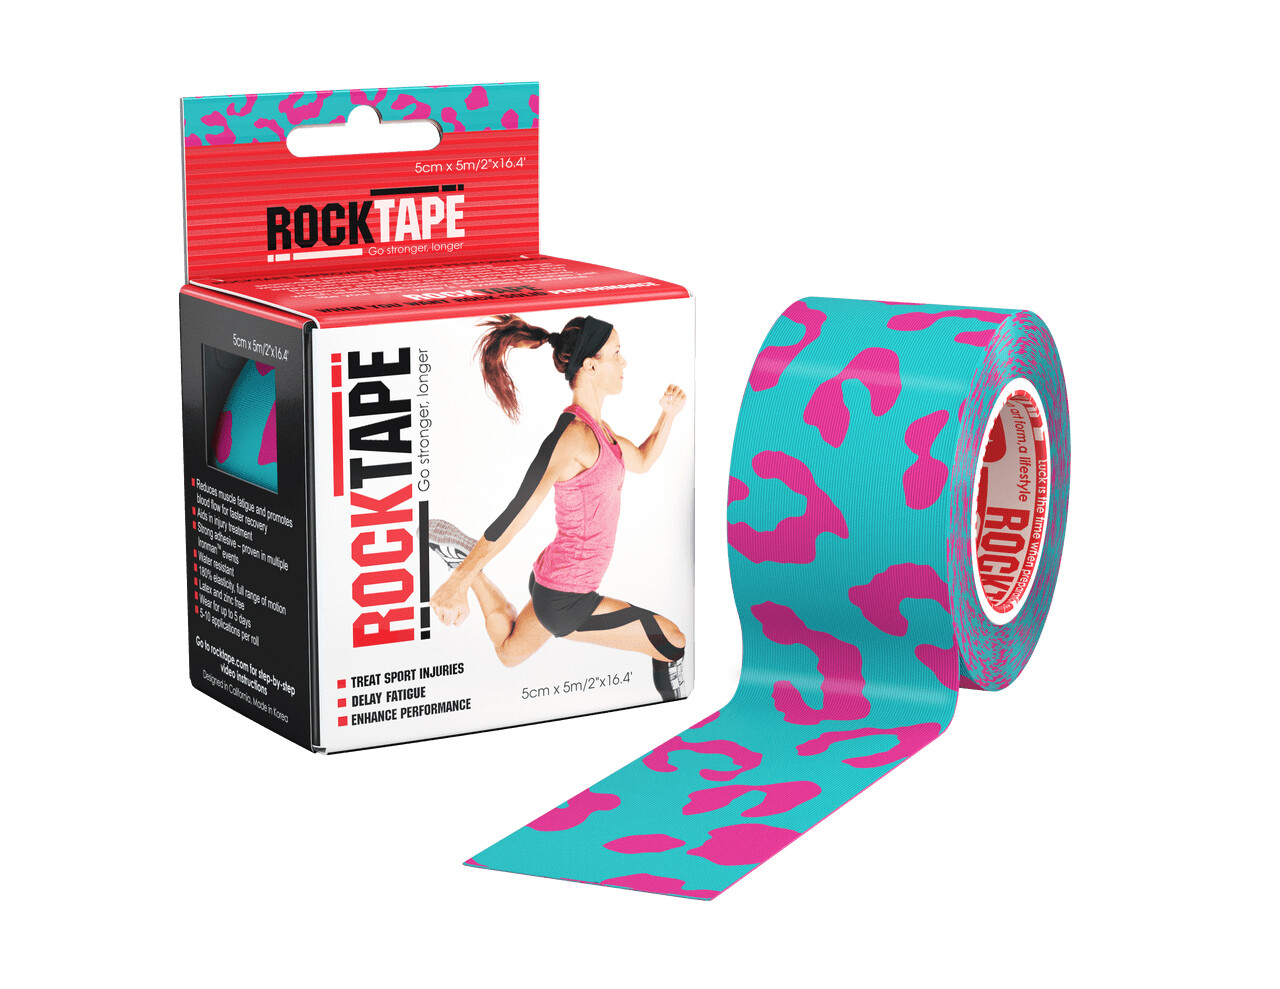 RockTape, 5см×5м, Miami Katz